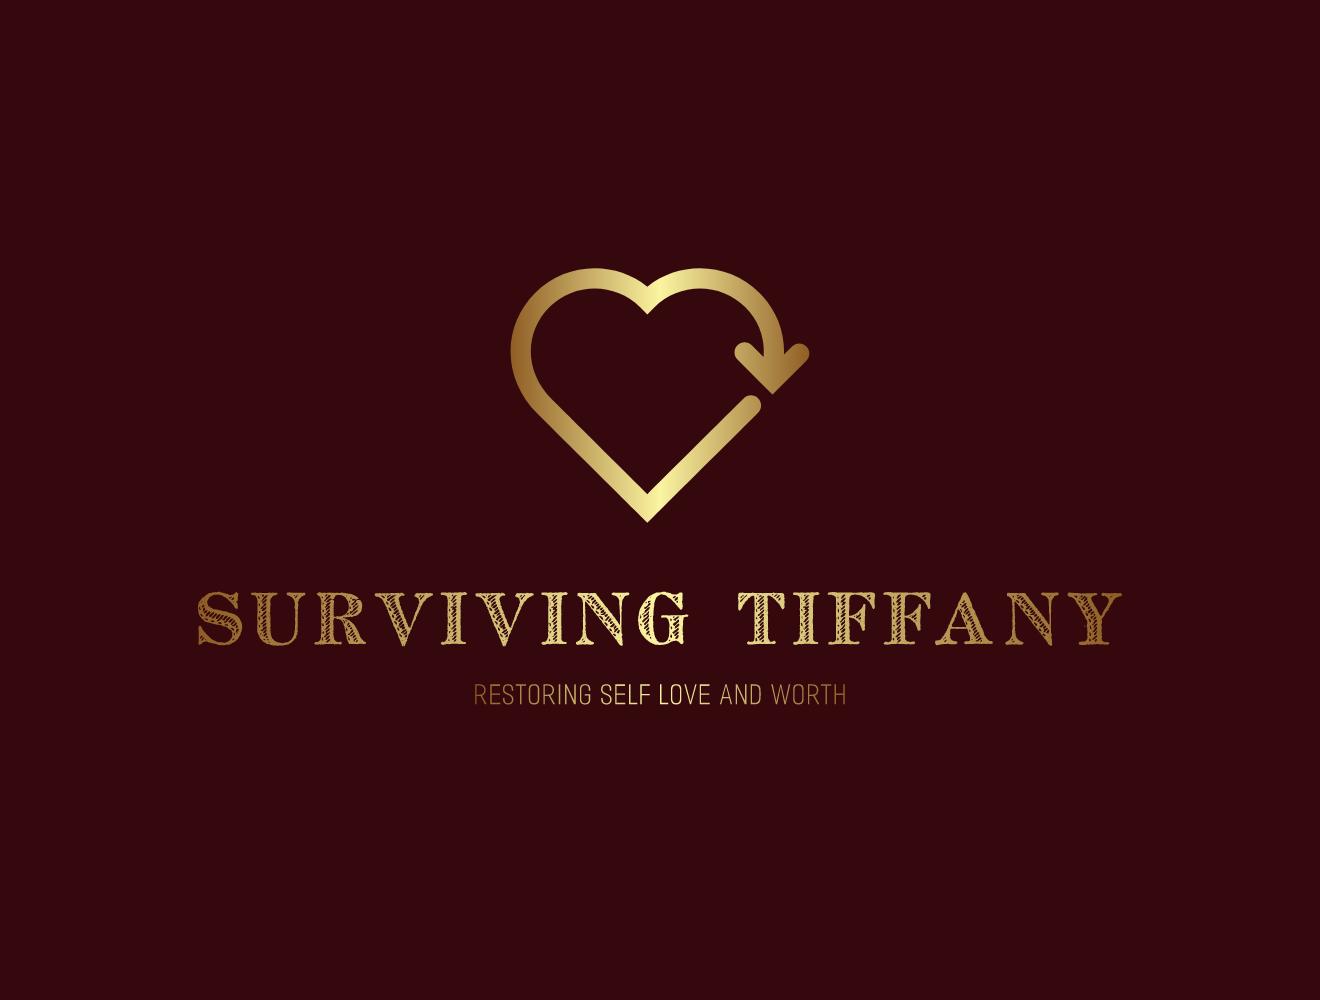 Surviving Tiffany: Restoring Self Love and Worth